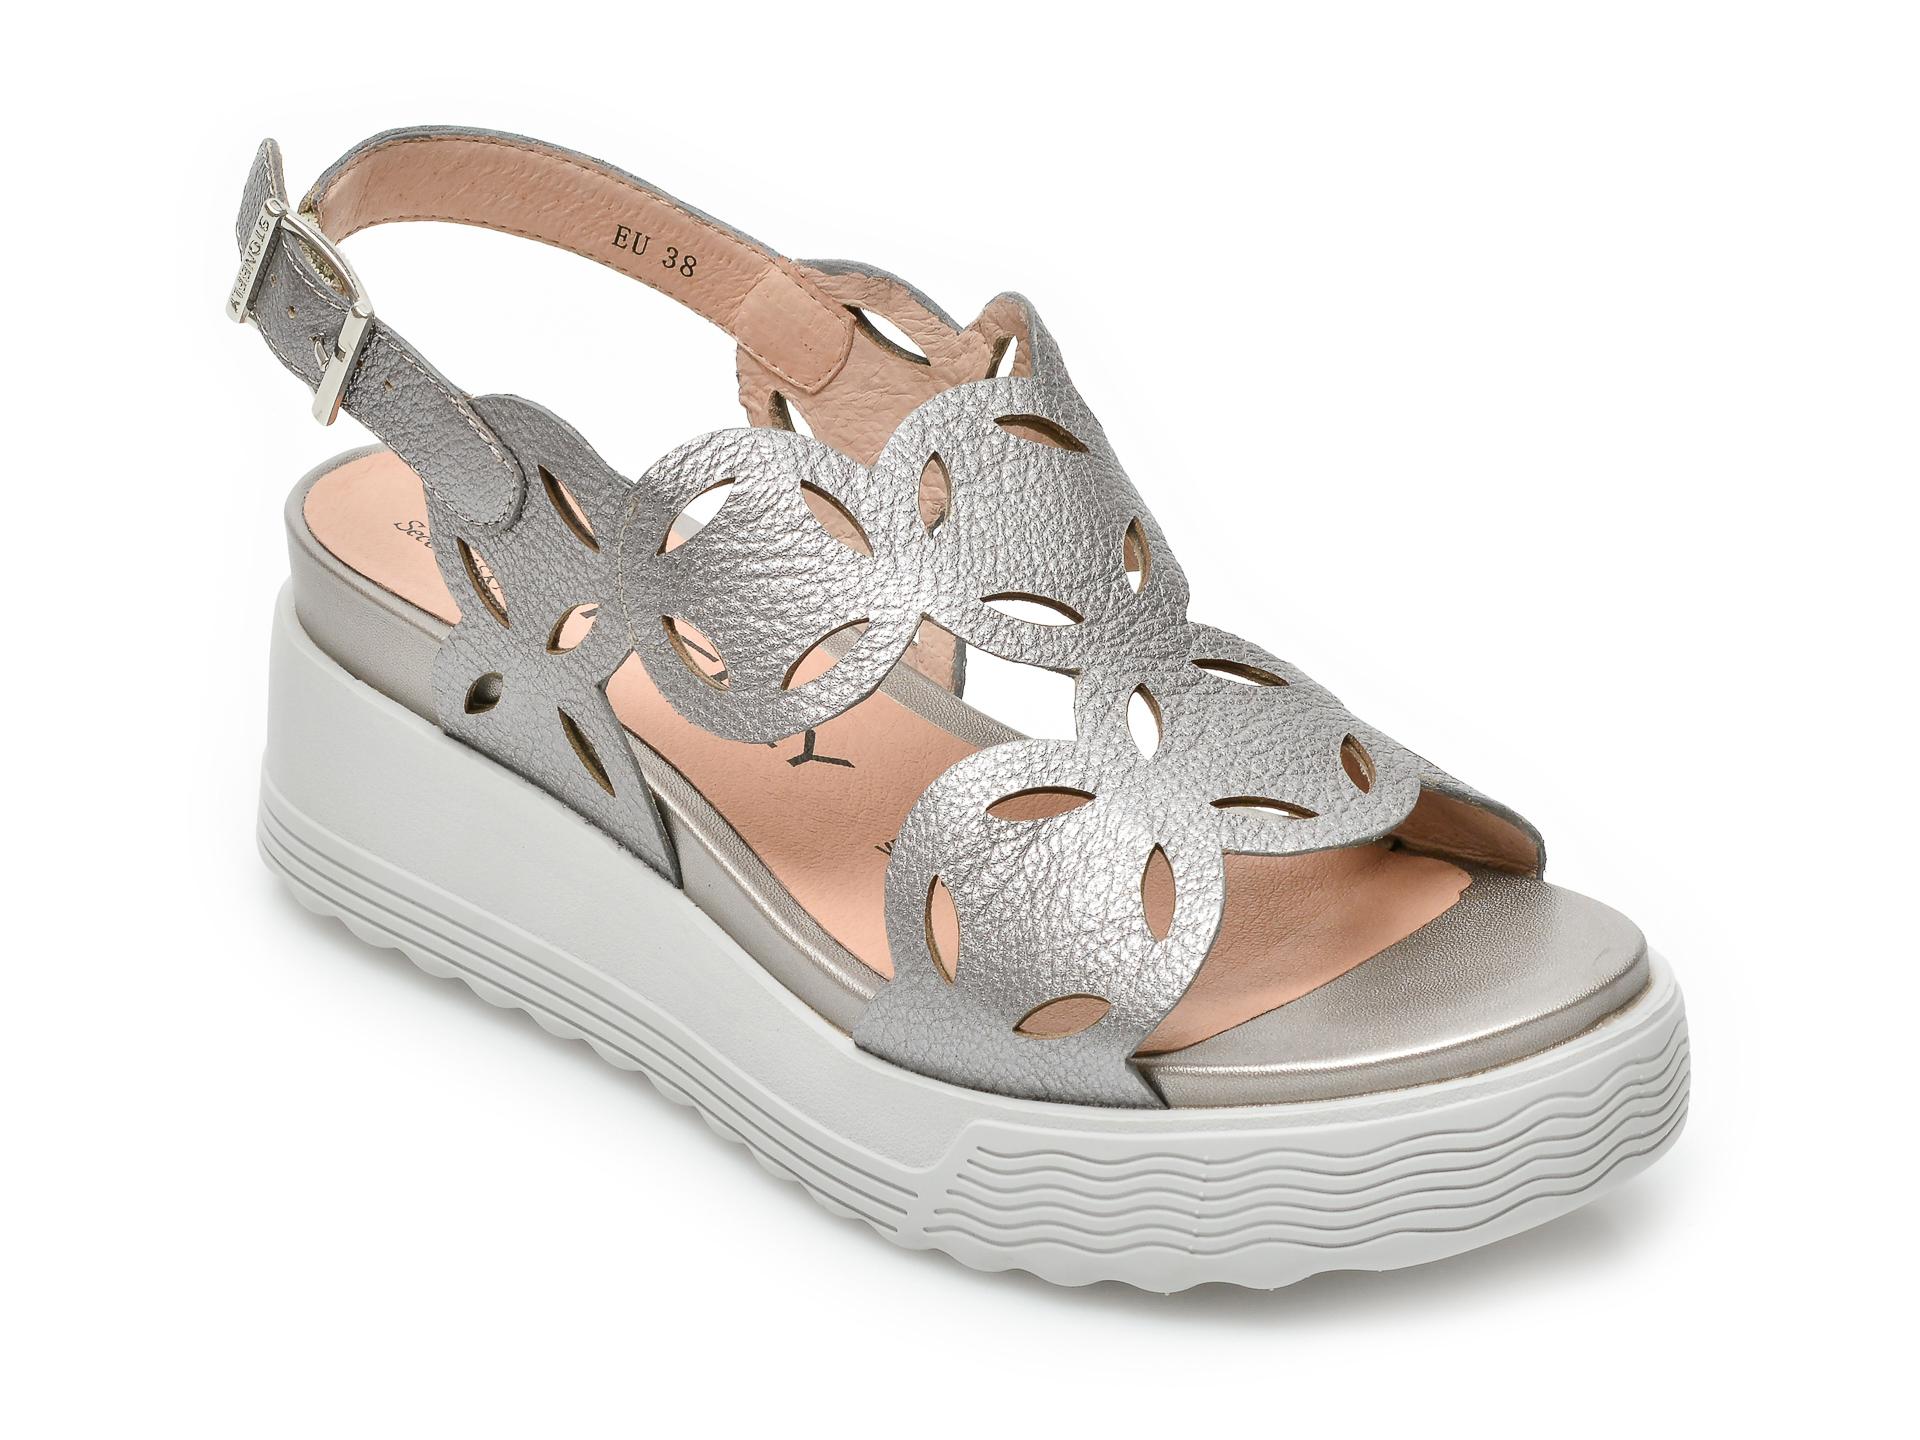 Sandale KAT MACONIE FOR EPICA argintii, ROXIE, din material textil si piele intoarsa